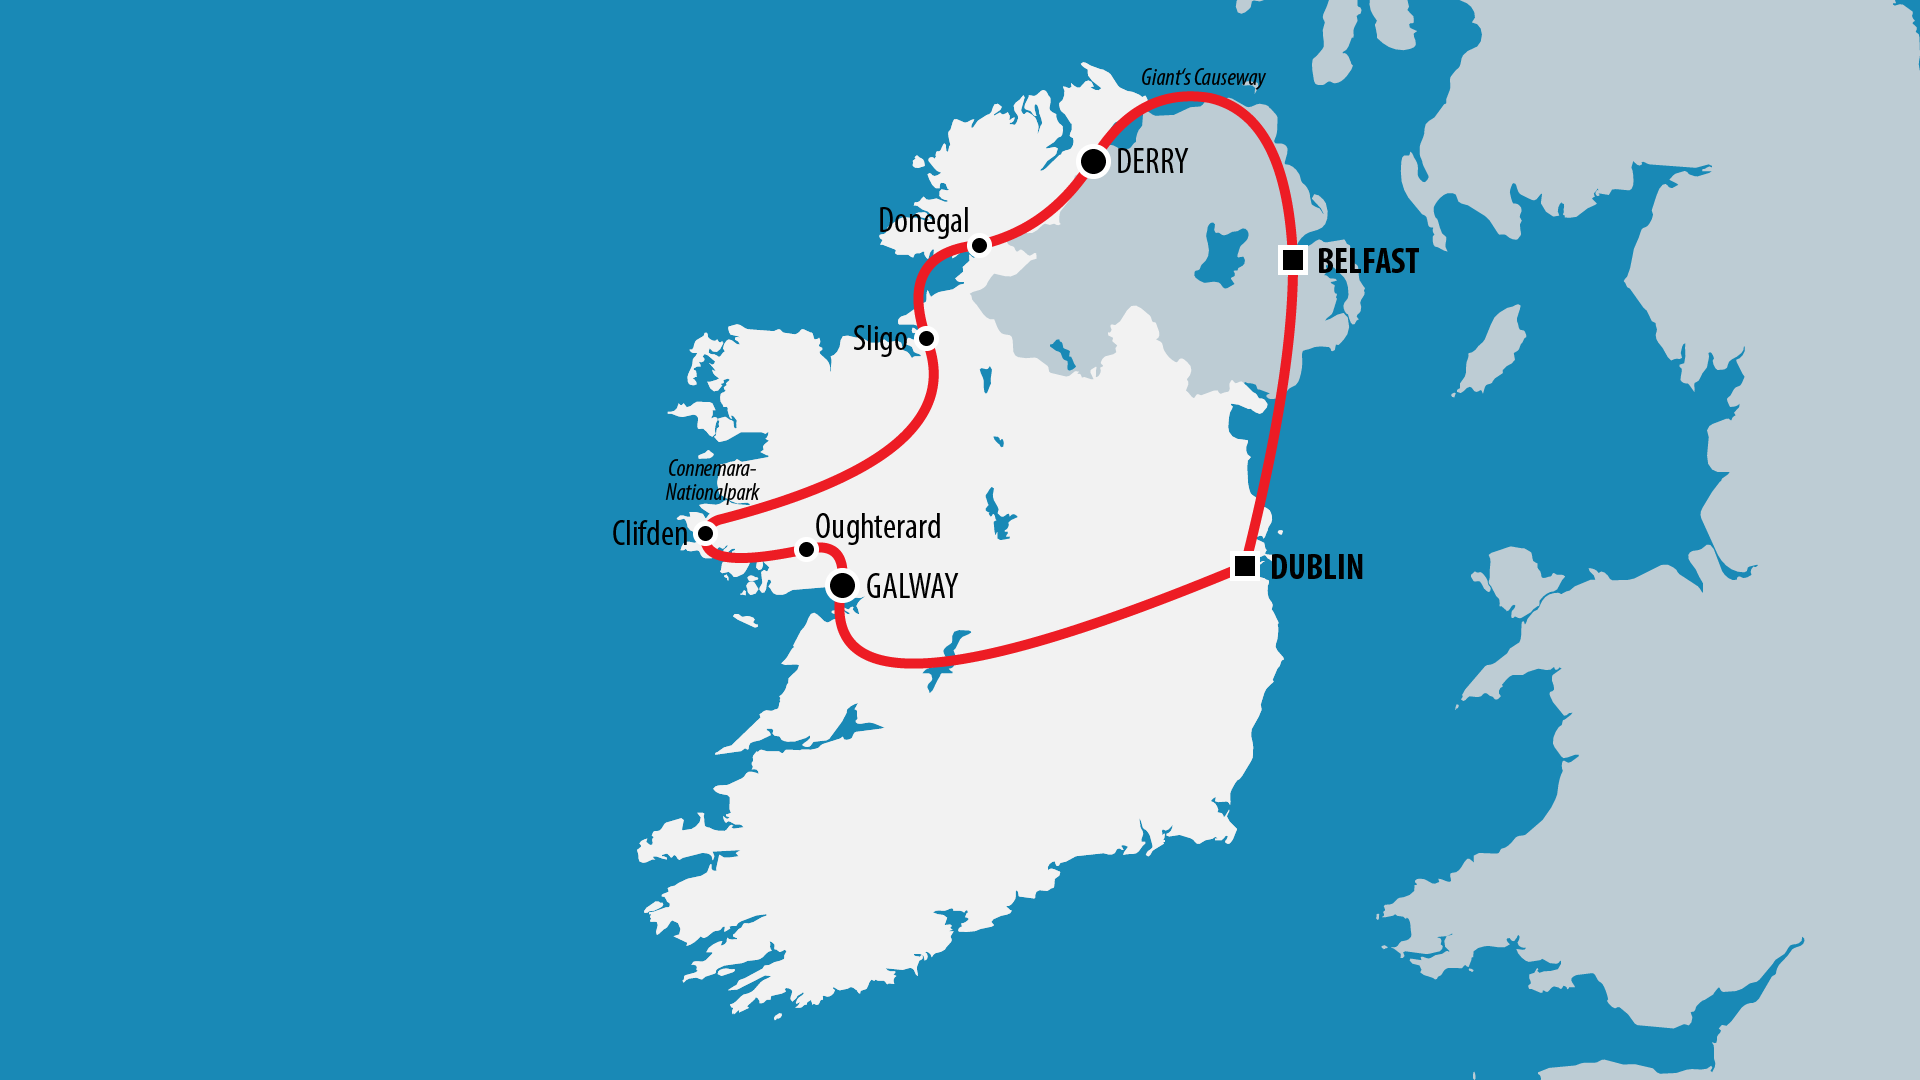 Reiseroute Irland 2006